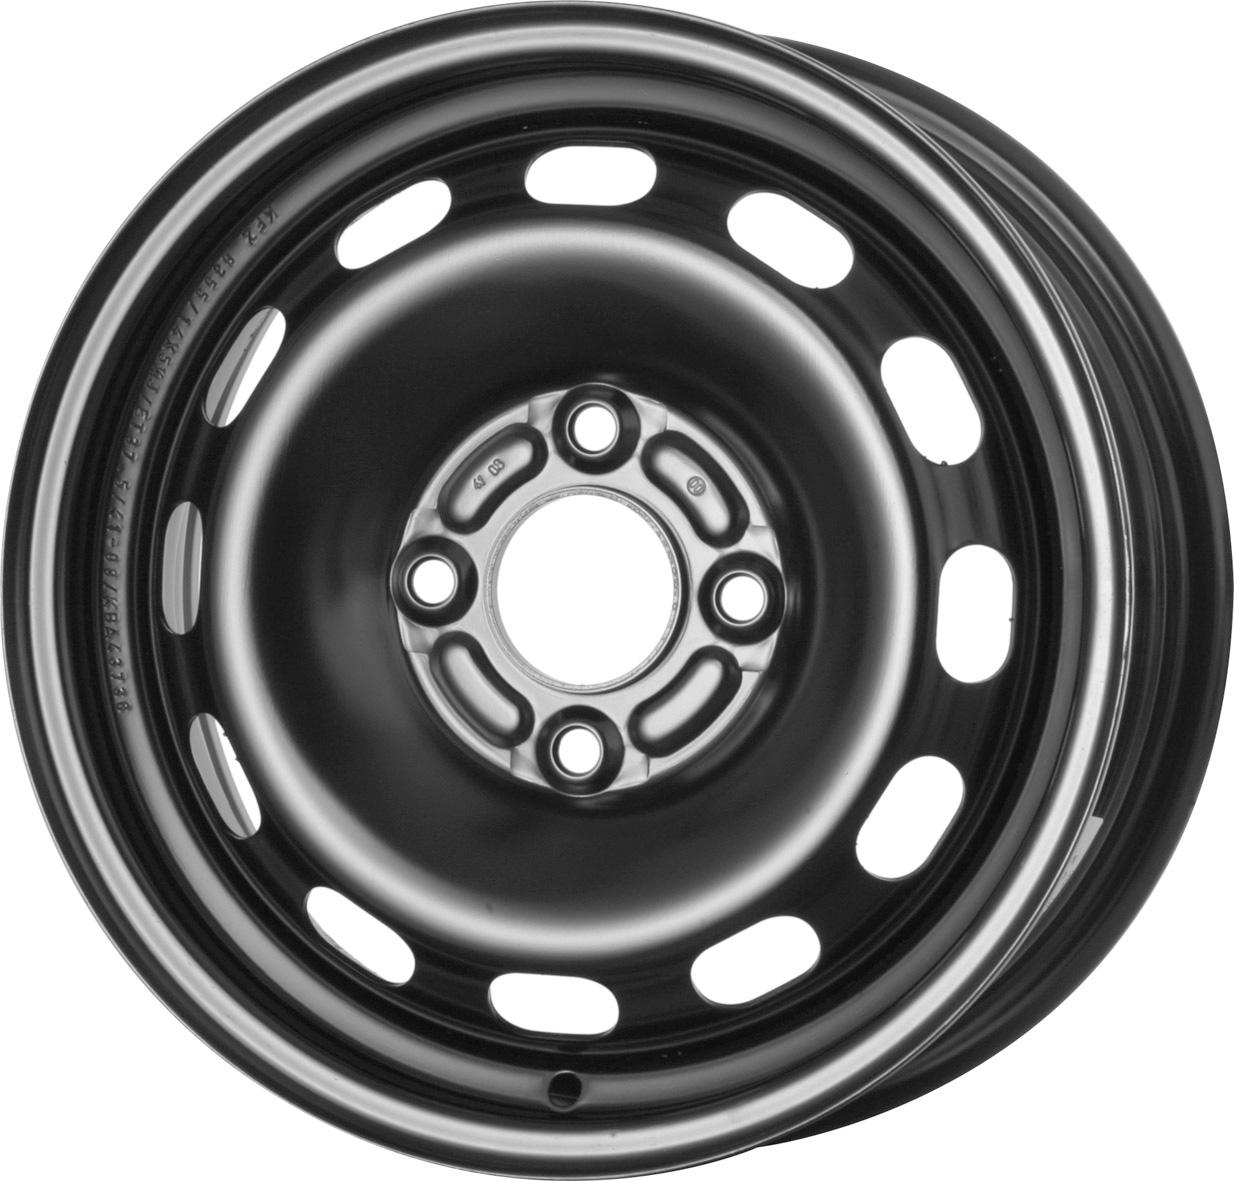 Vorschau: 14″ Stahlrad Sommer für Ford Fiesta 1.4 LPG (JA8-LPG) Kumho KH27 175/65 R14 82T